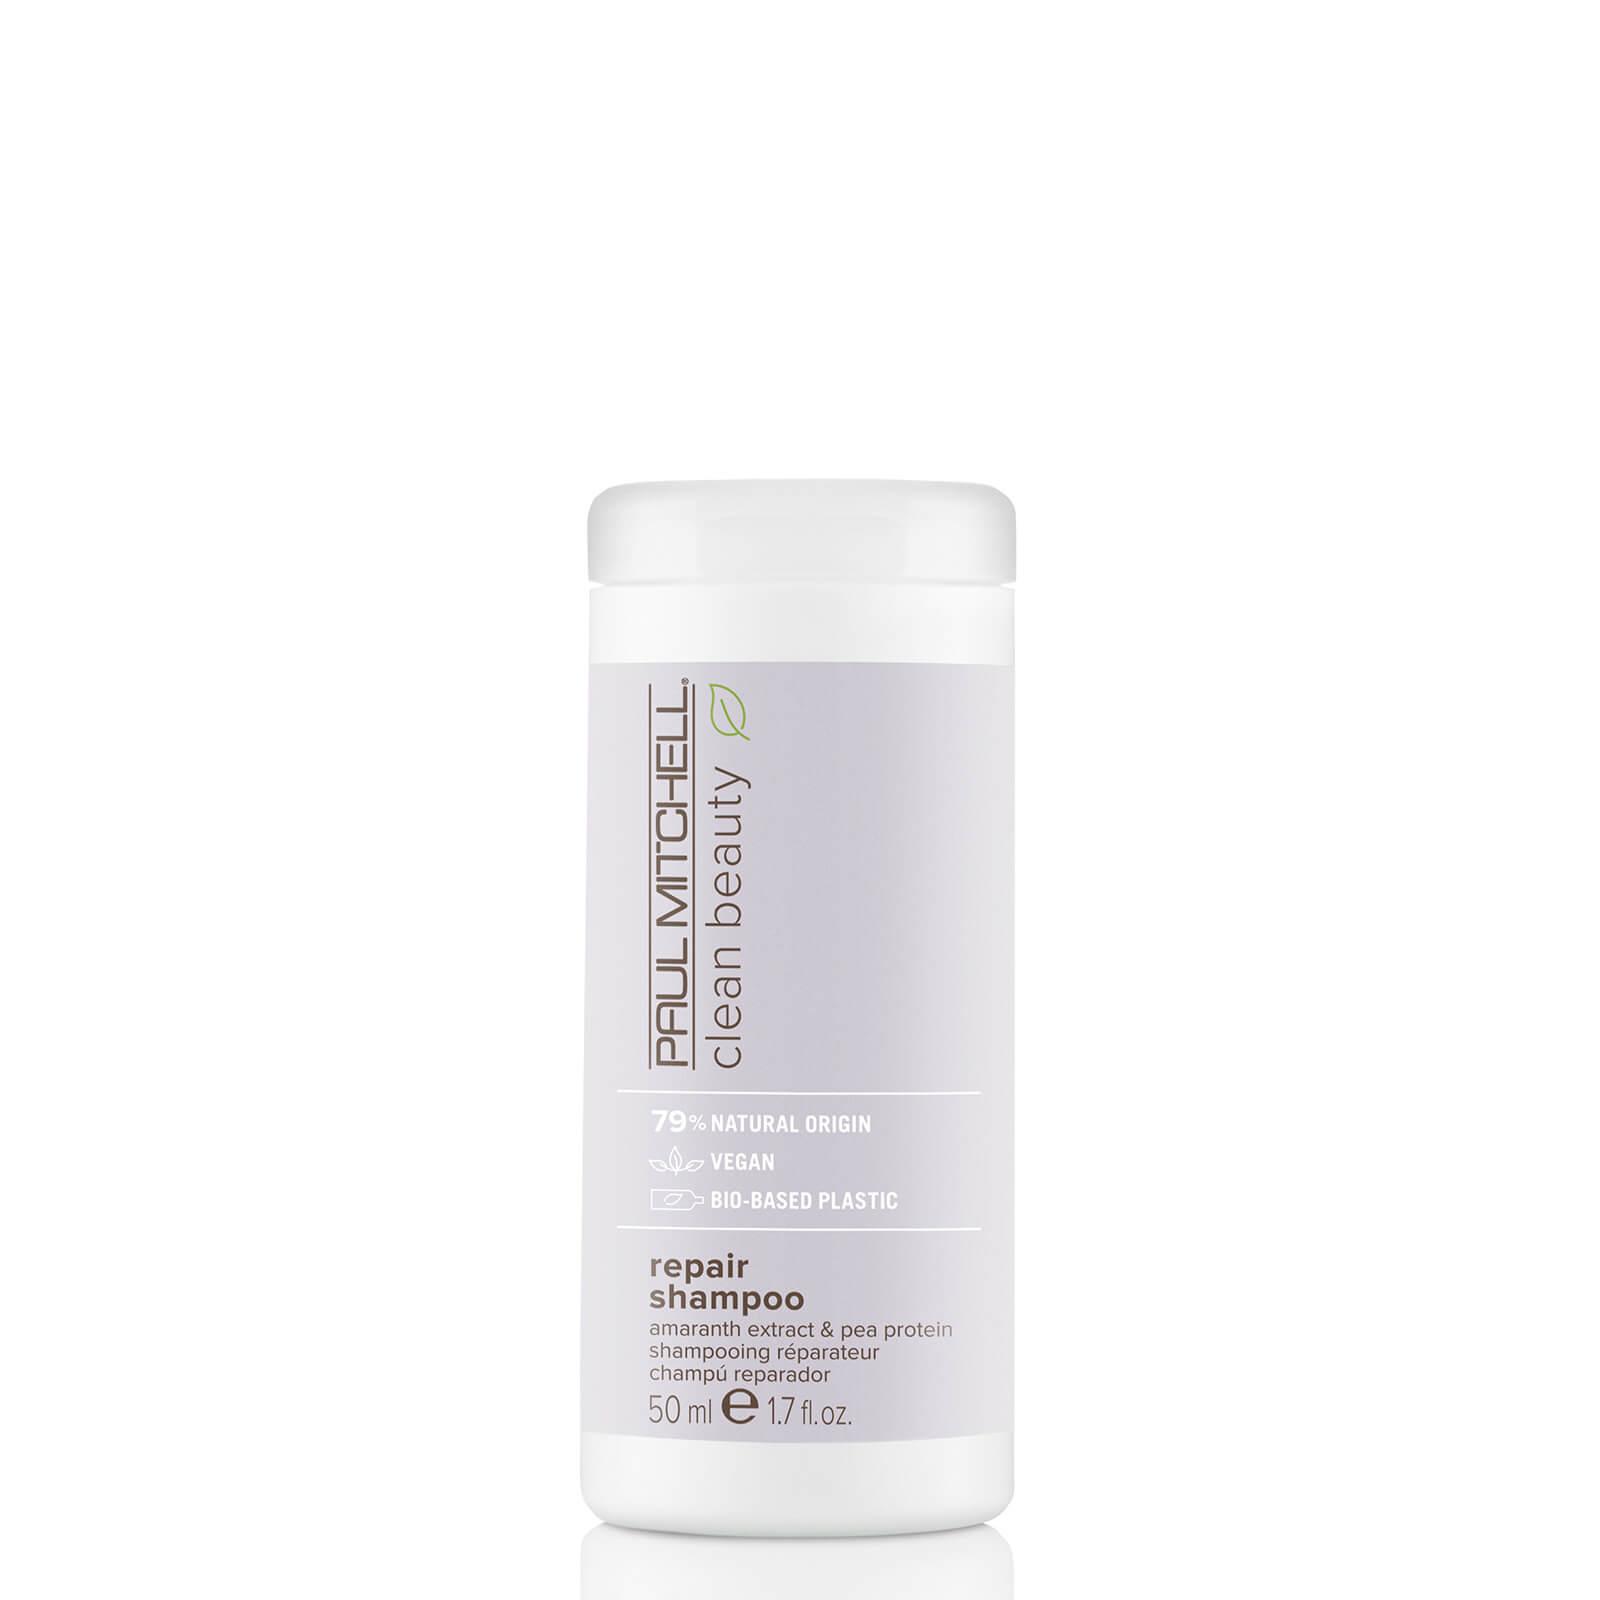 Купить Paul Mitchell Clean Beauty Everyday Conditioner 250ml